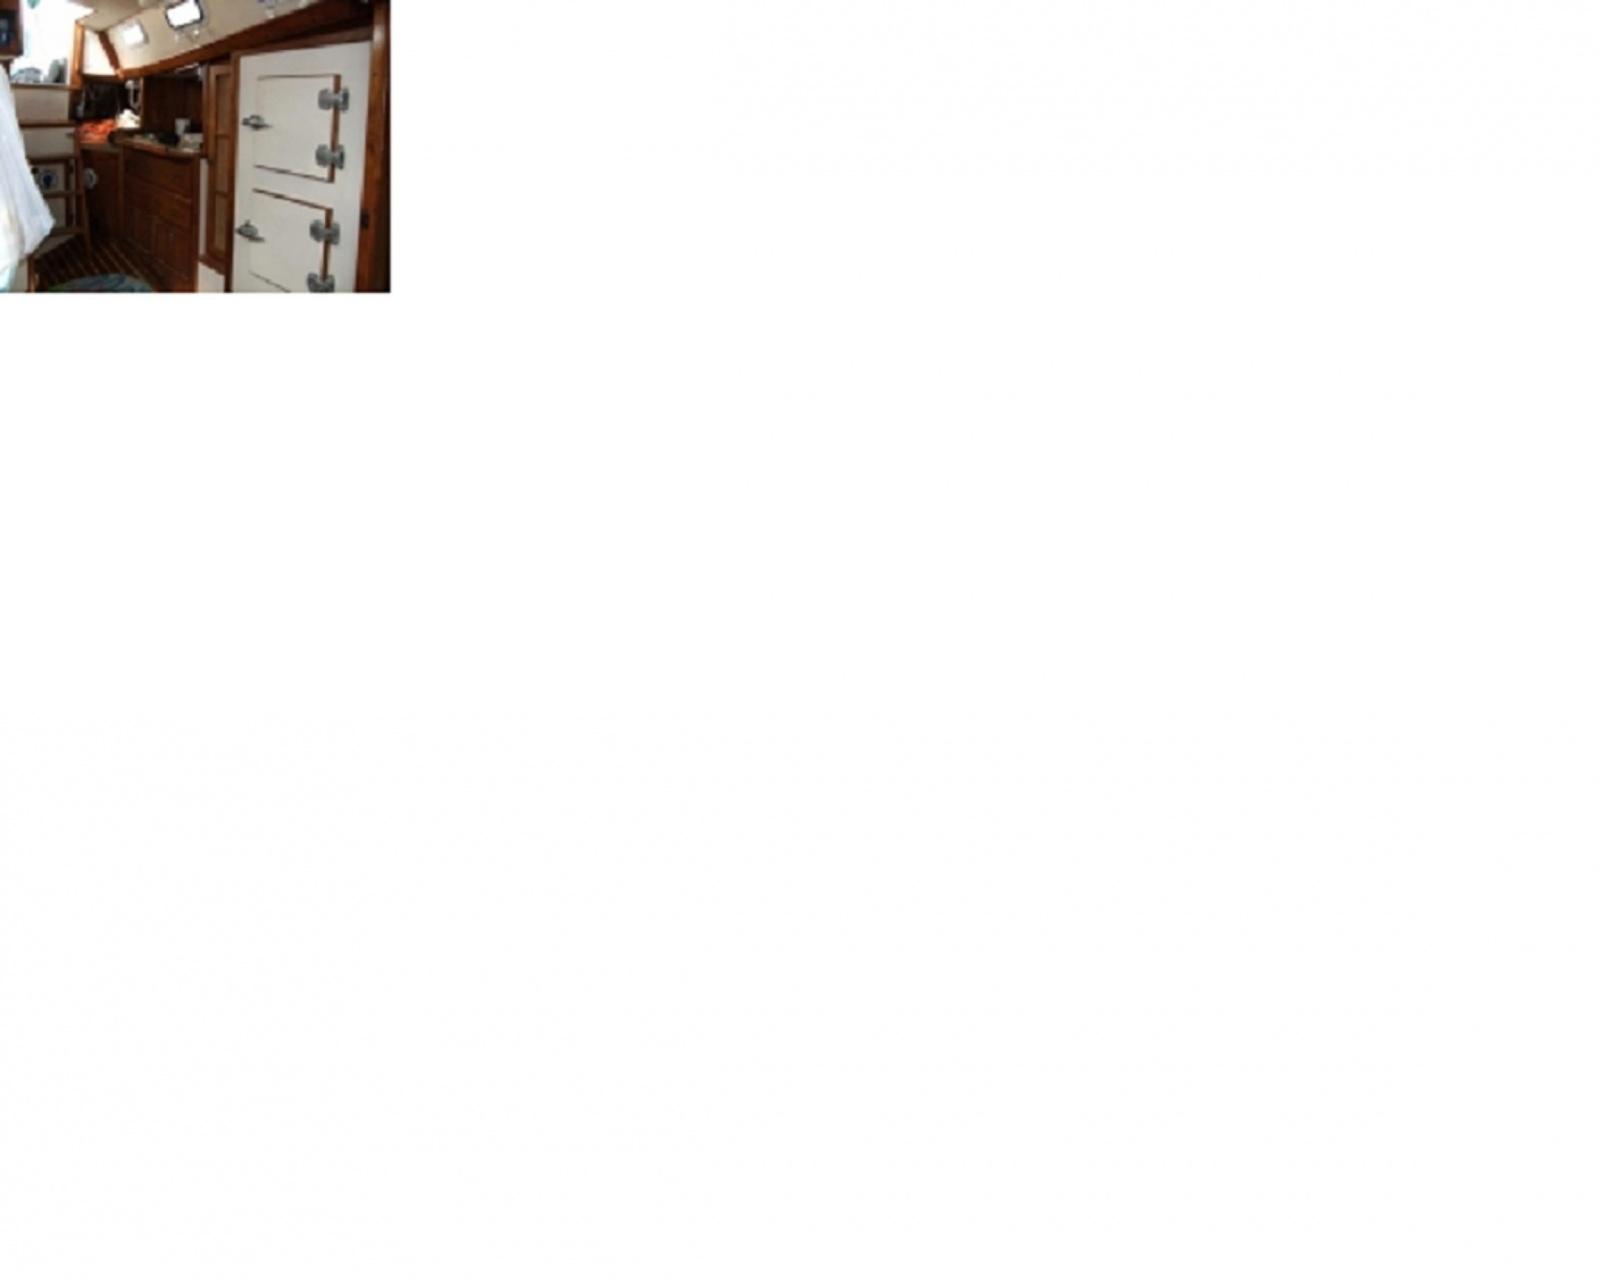 Click image for larger version  Name:fridge.jpg Views:84 Size:125.3 KB ID:18047